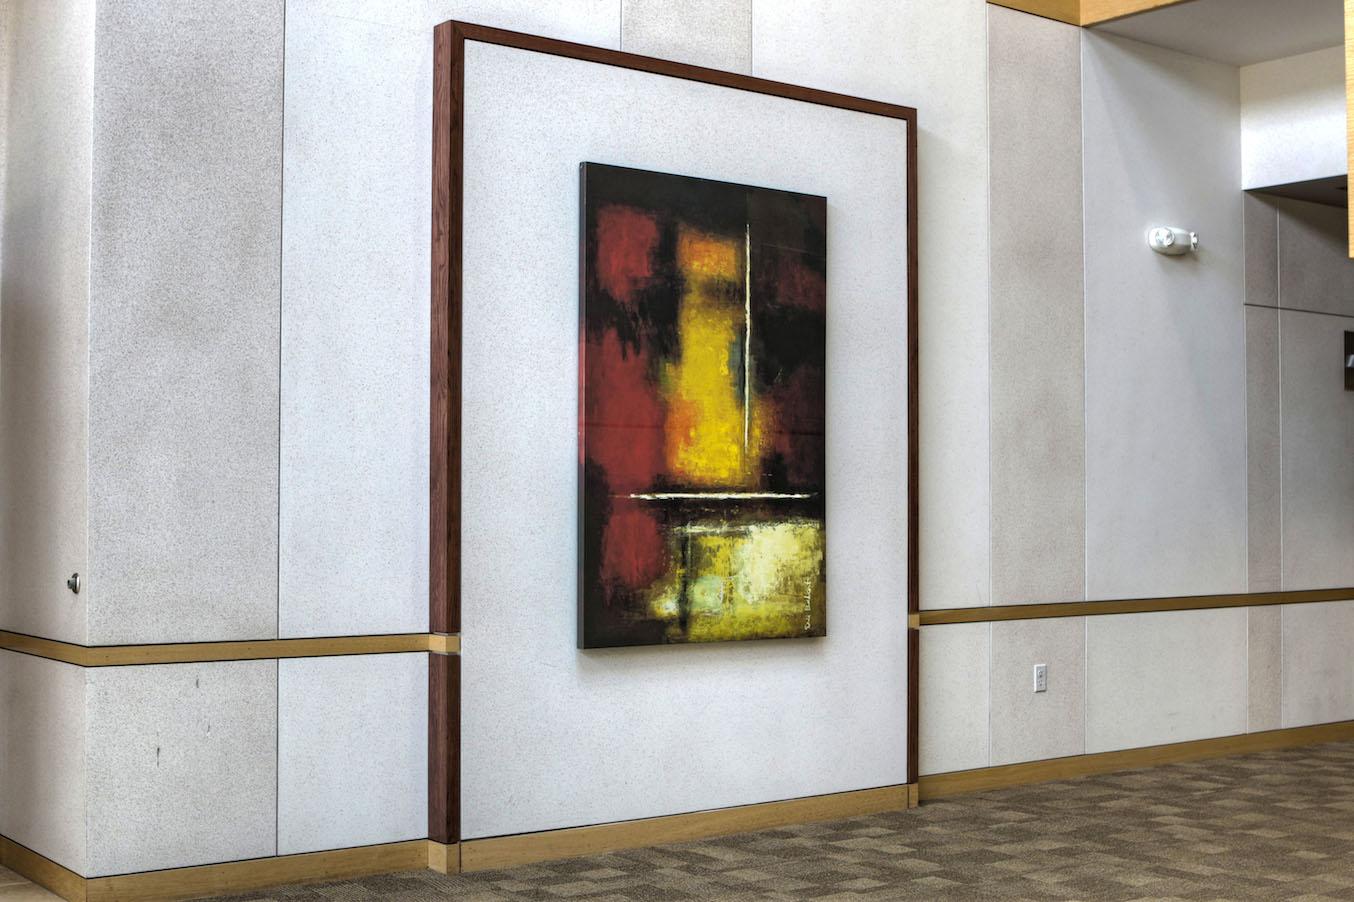 4-Vanta-Properties-Deming-Way-Concepts-in-Art-LLC